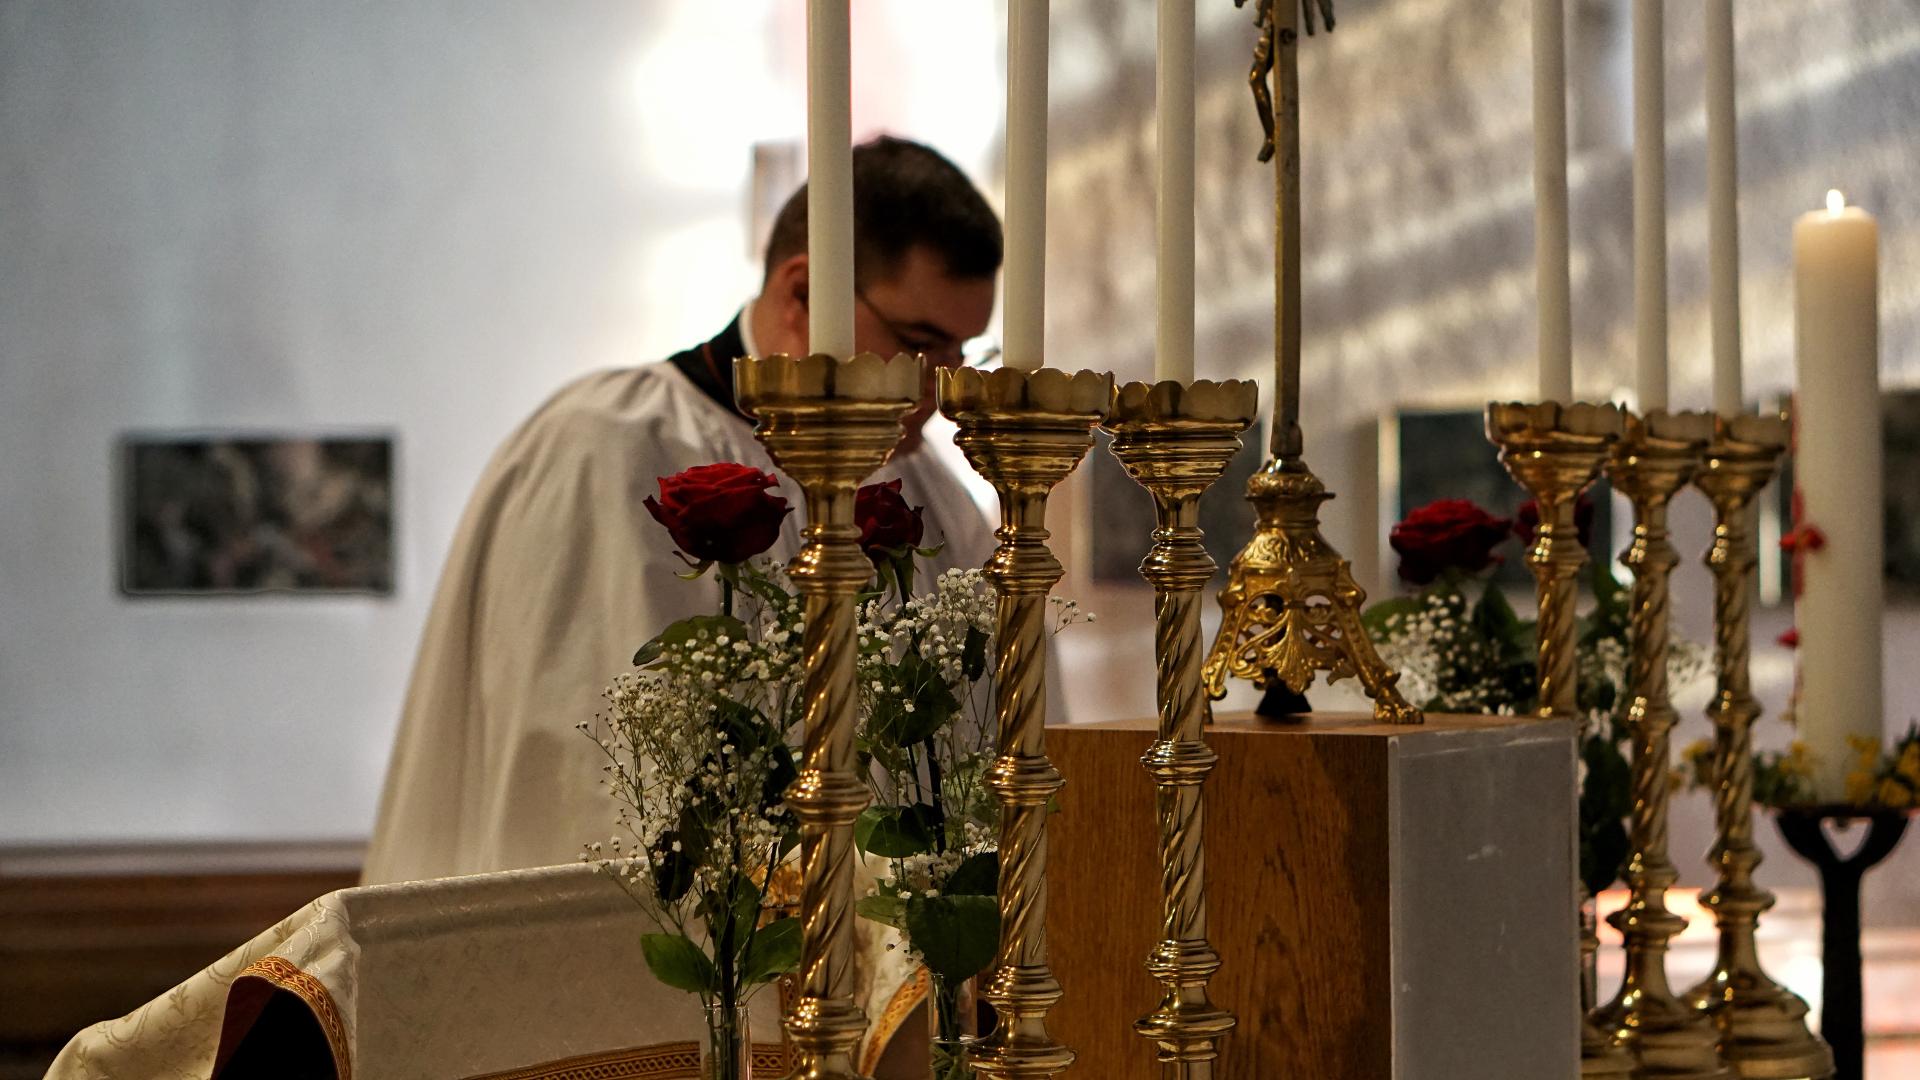 Altardienst Osterkonvent Marburg 2018